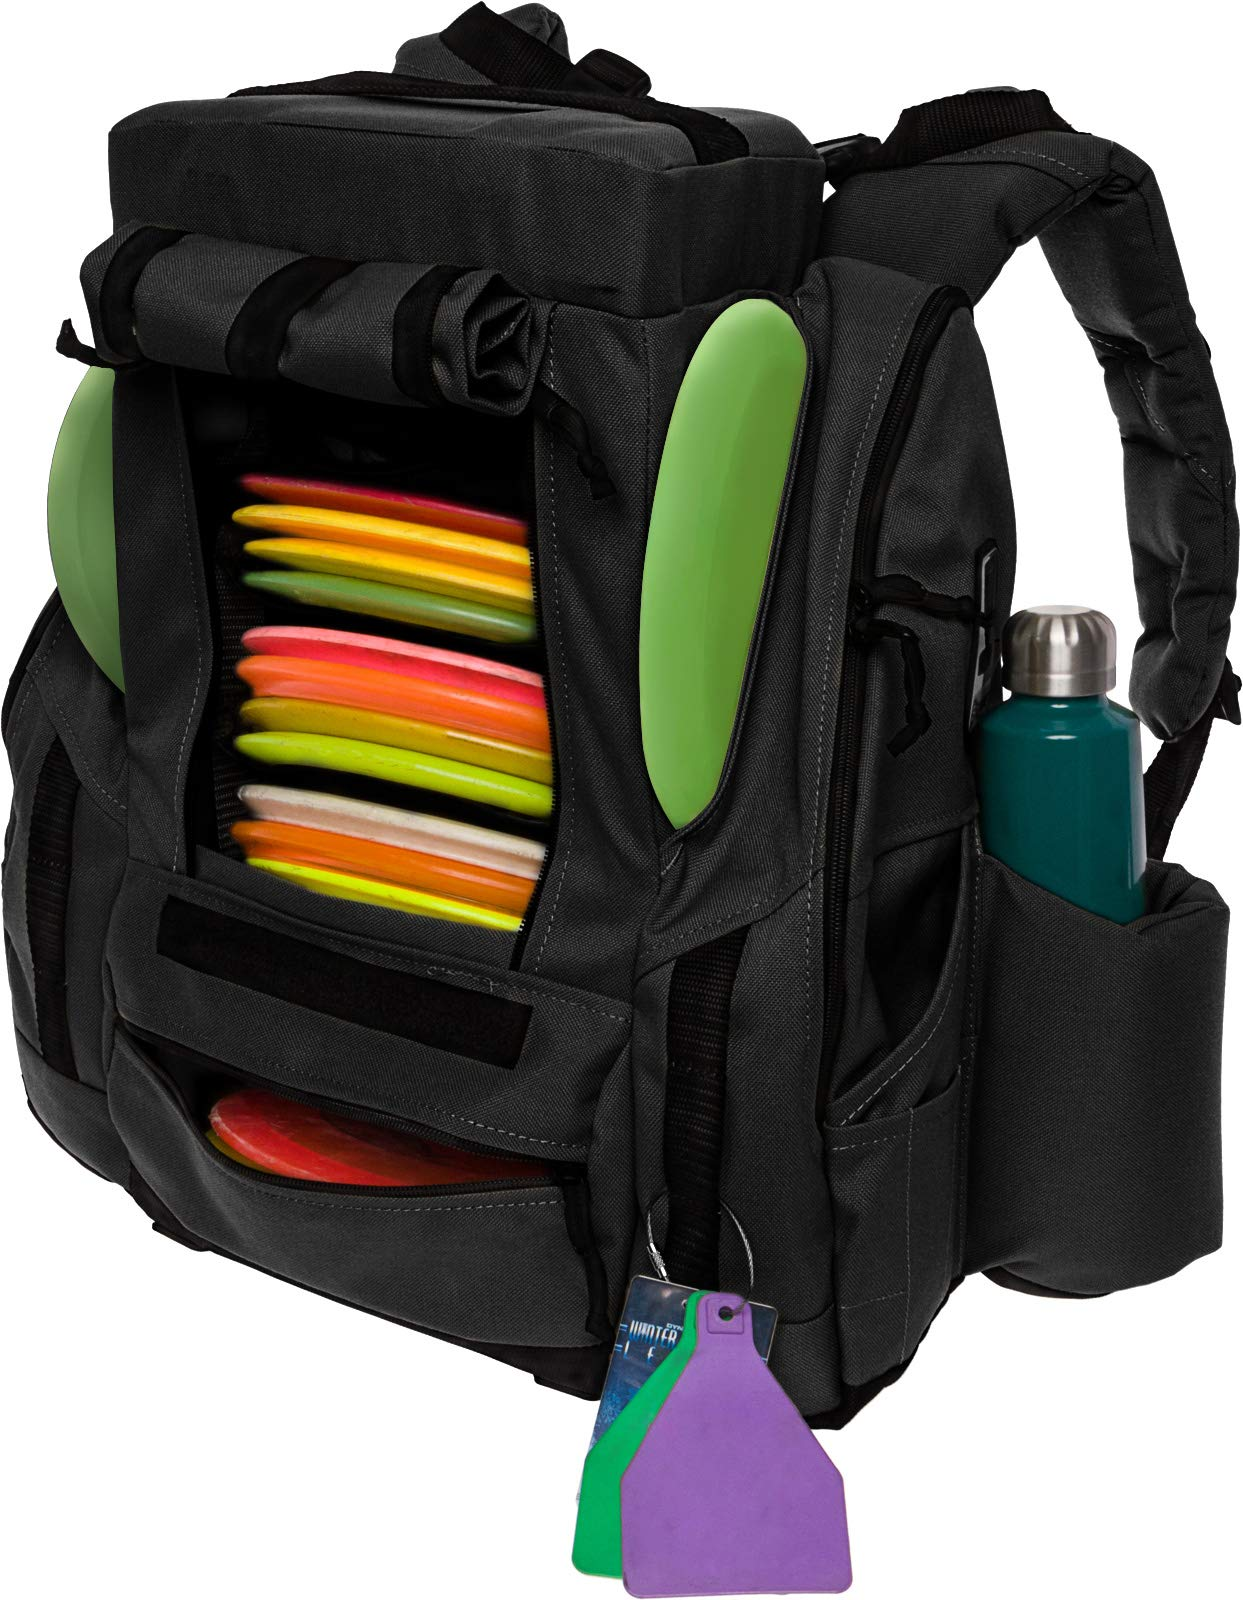 BagLane Fusion Elite Disc Golf Backpack Bag w/Seat & Cooler- 25+ Capacity (Black) by BagLane